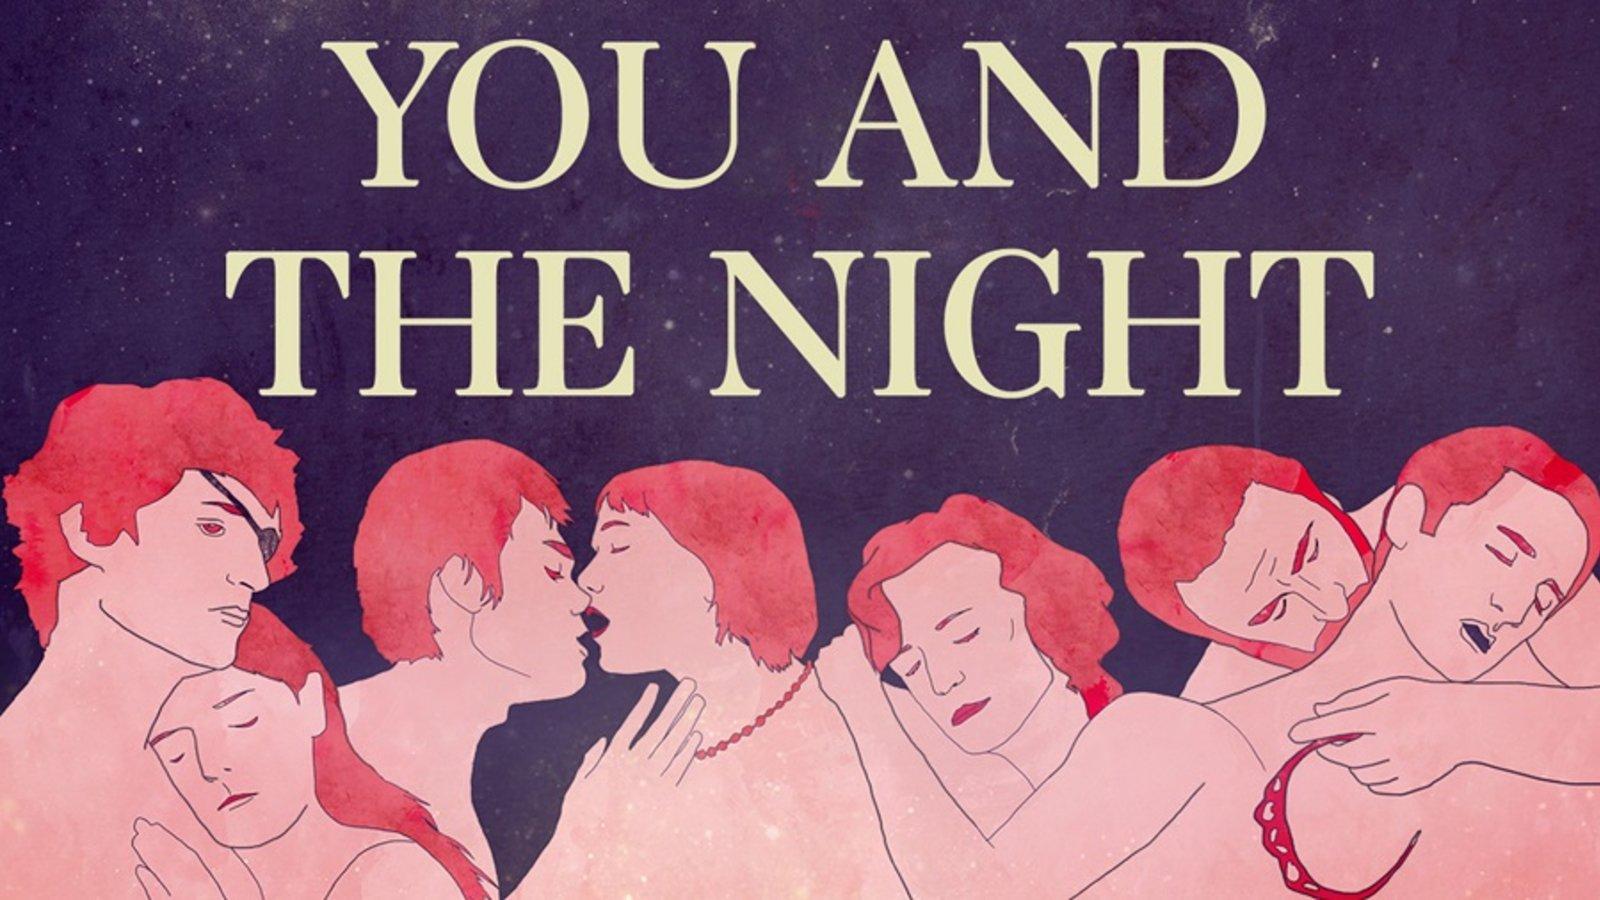 You and The Night - Les rencontres d'après minuit